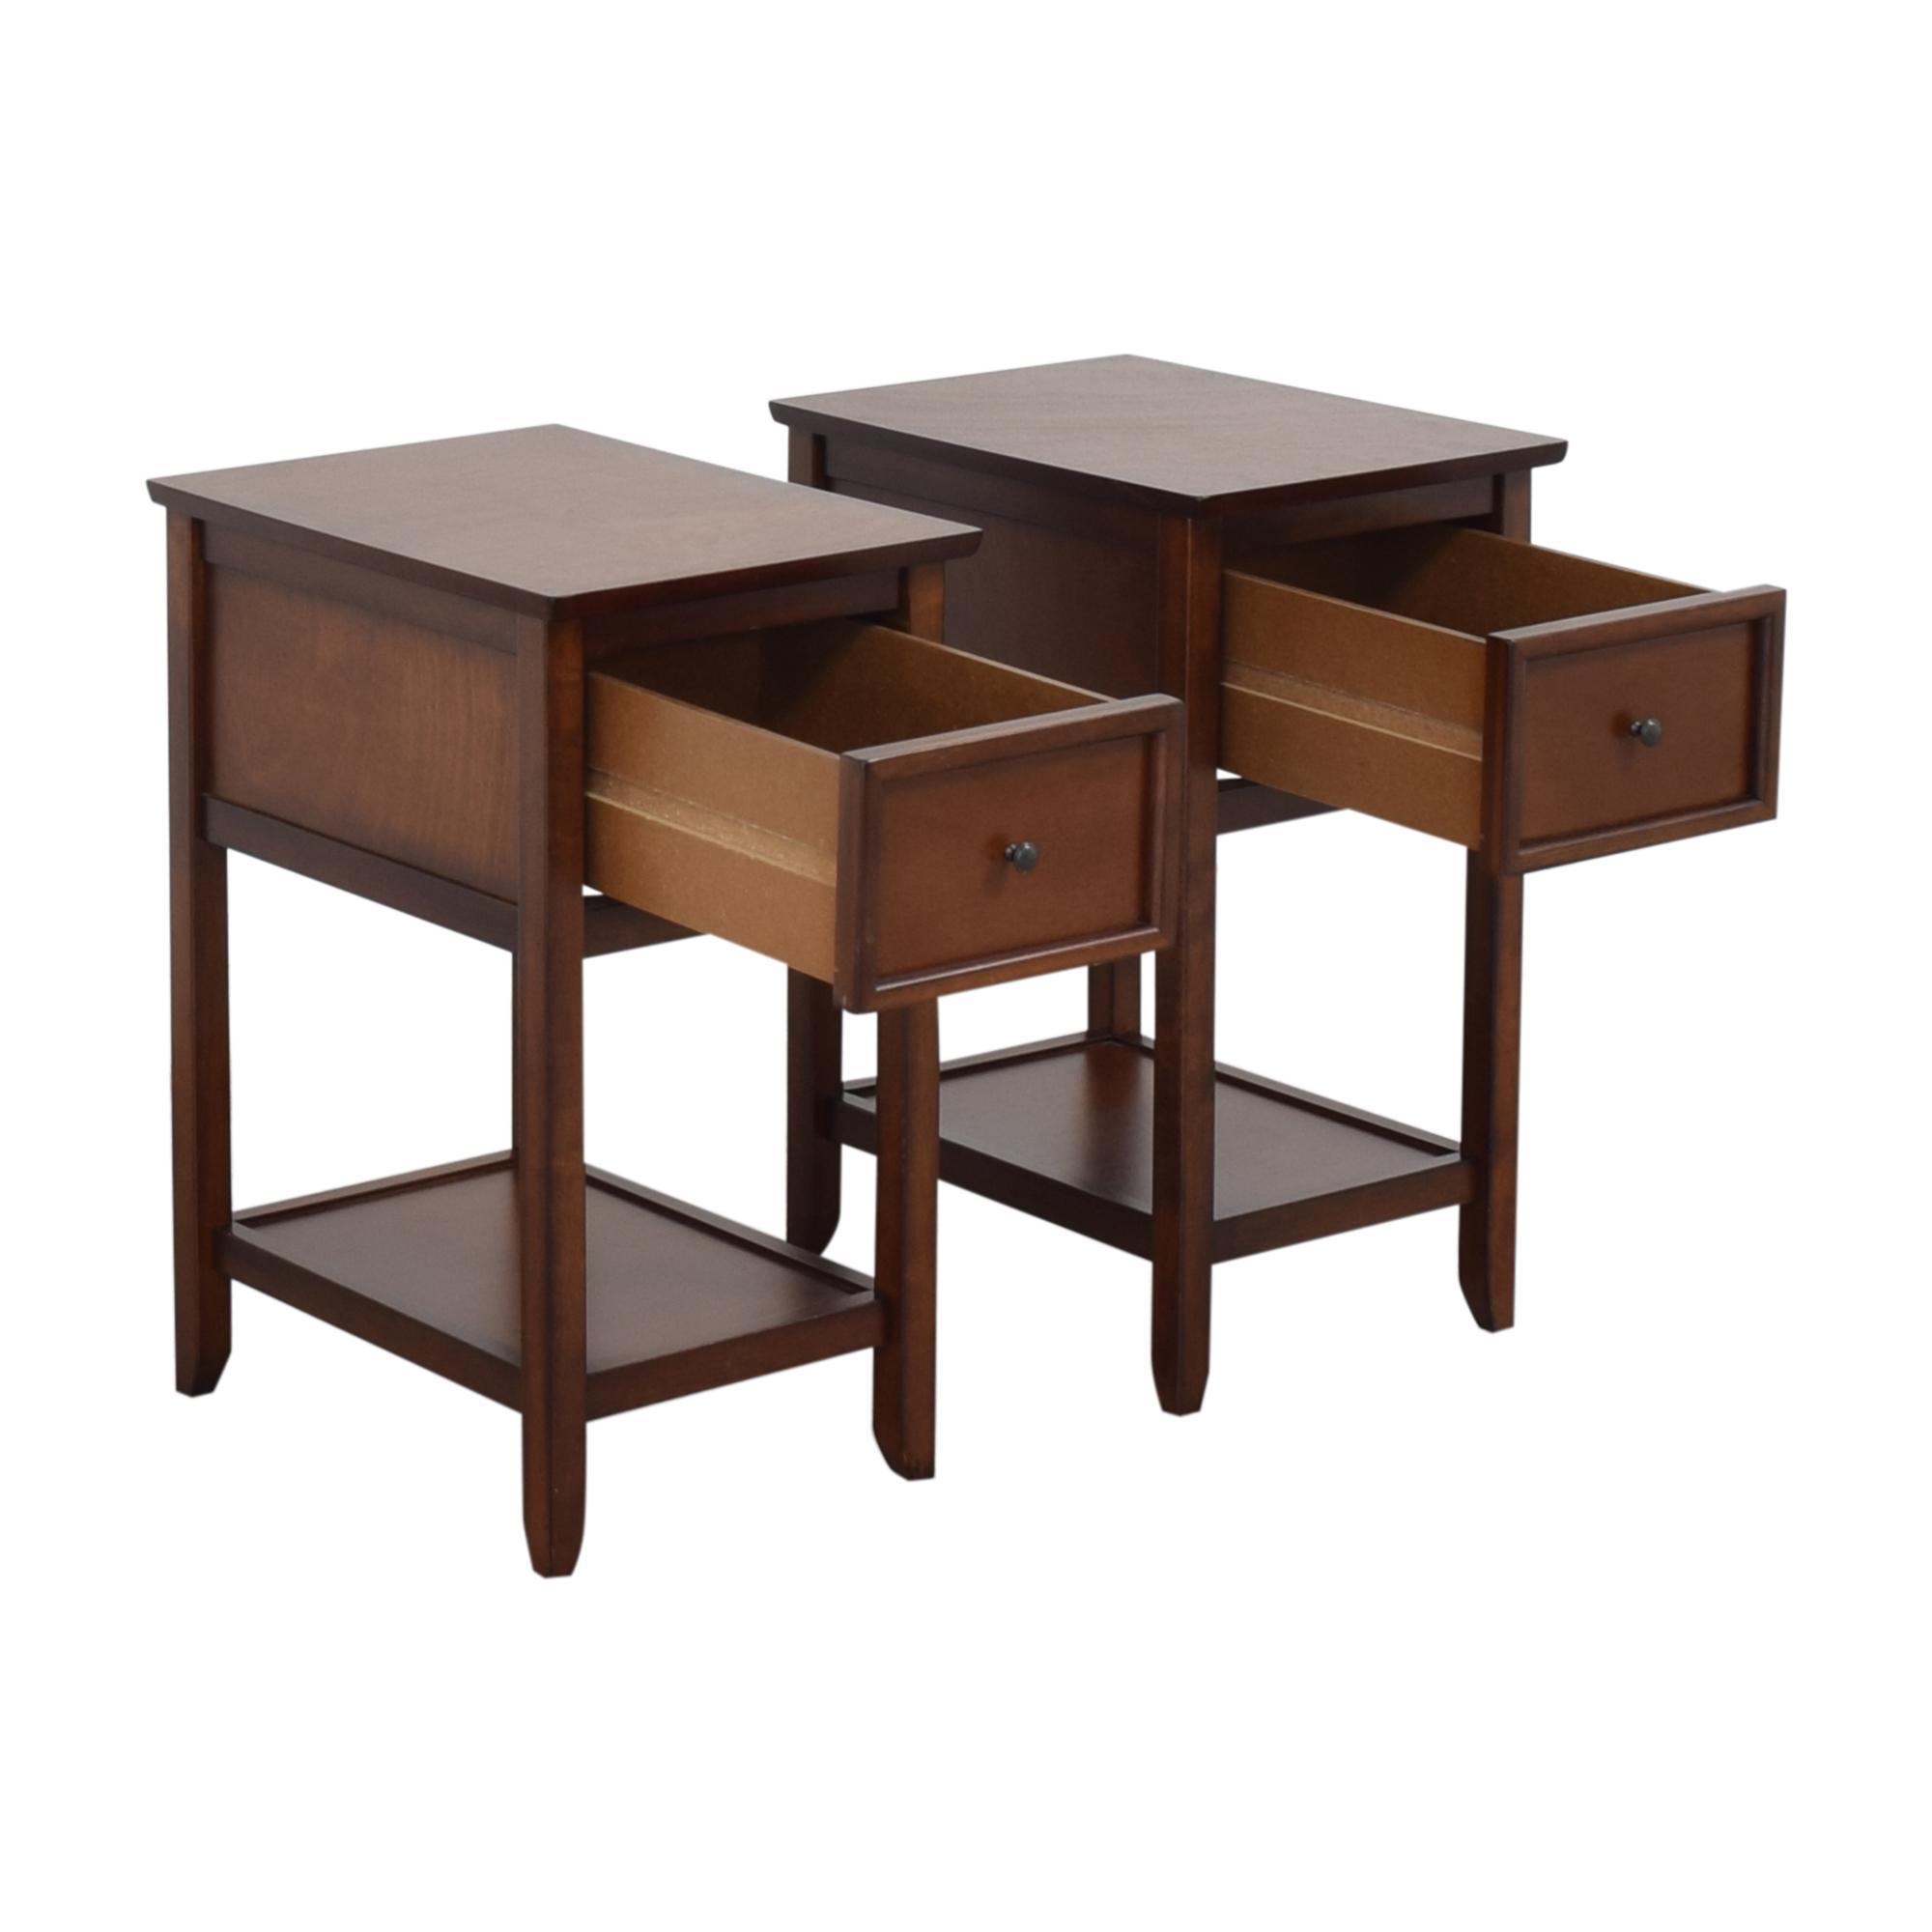 Pier 1 End Tables / End Tables